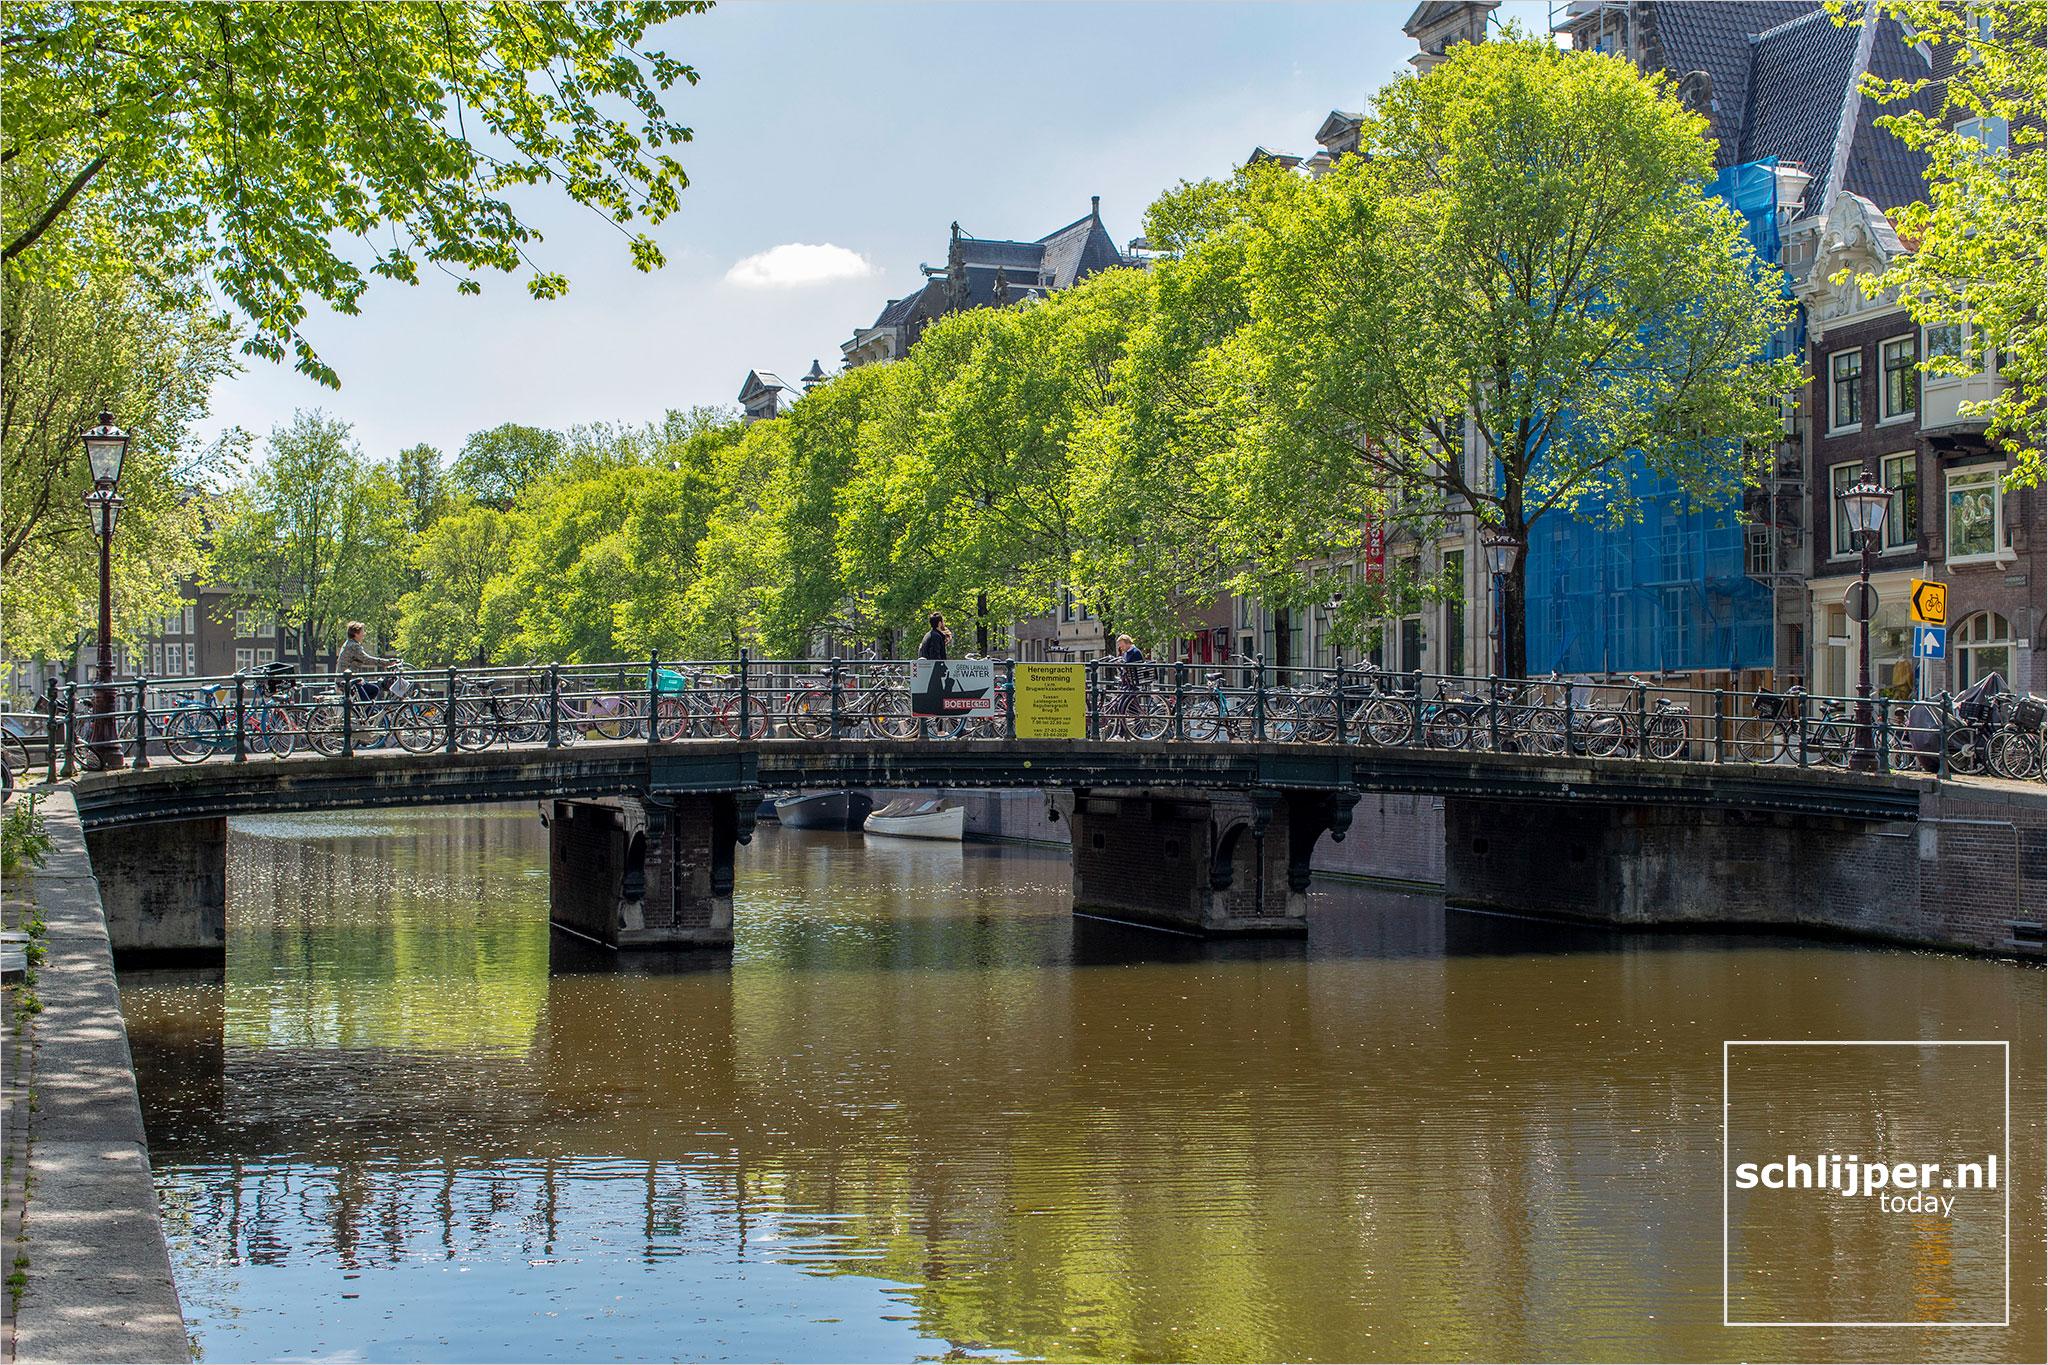 Nederland, Amsterdam, 4 mei 2020